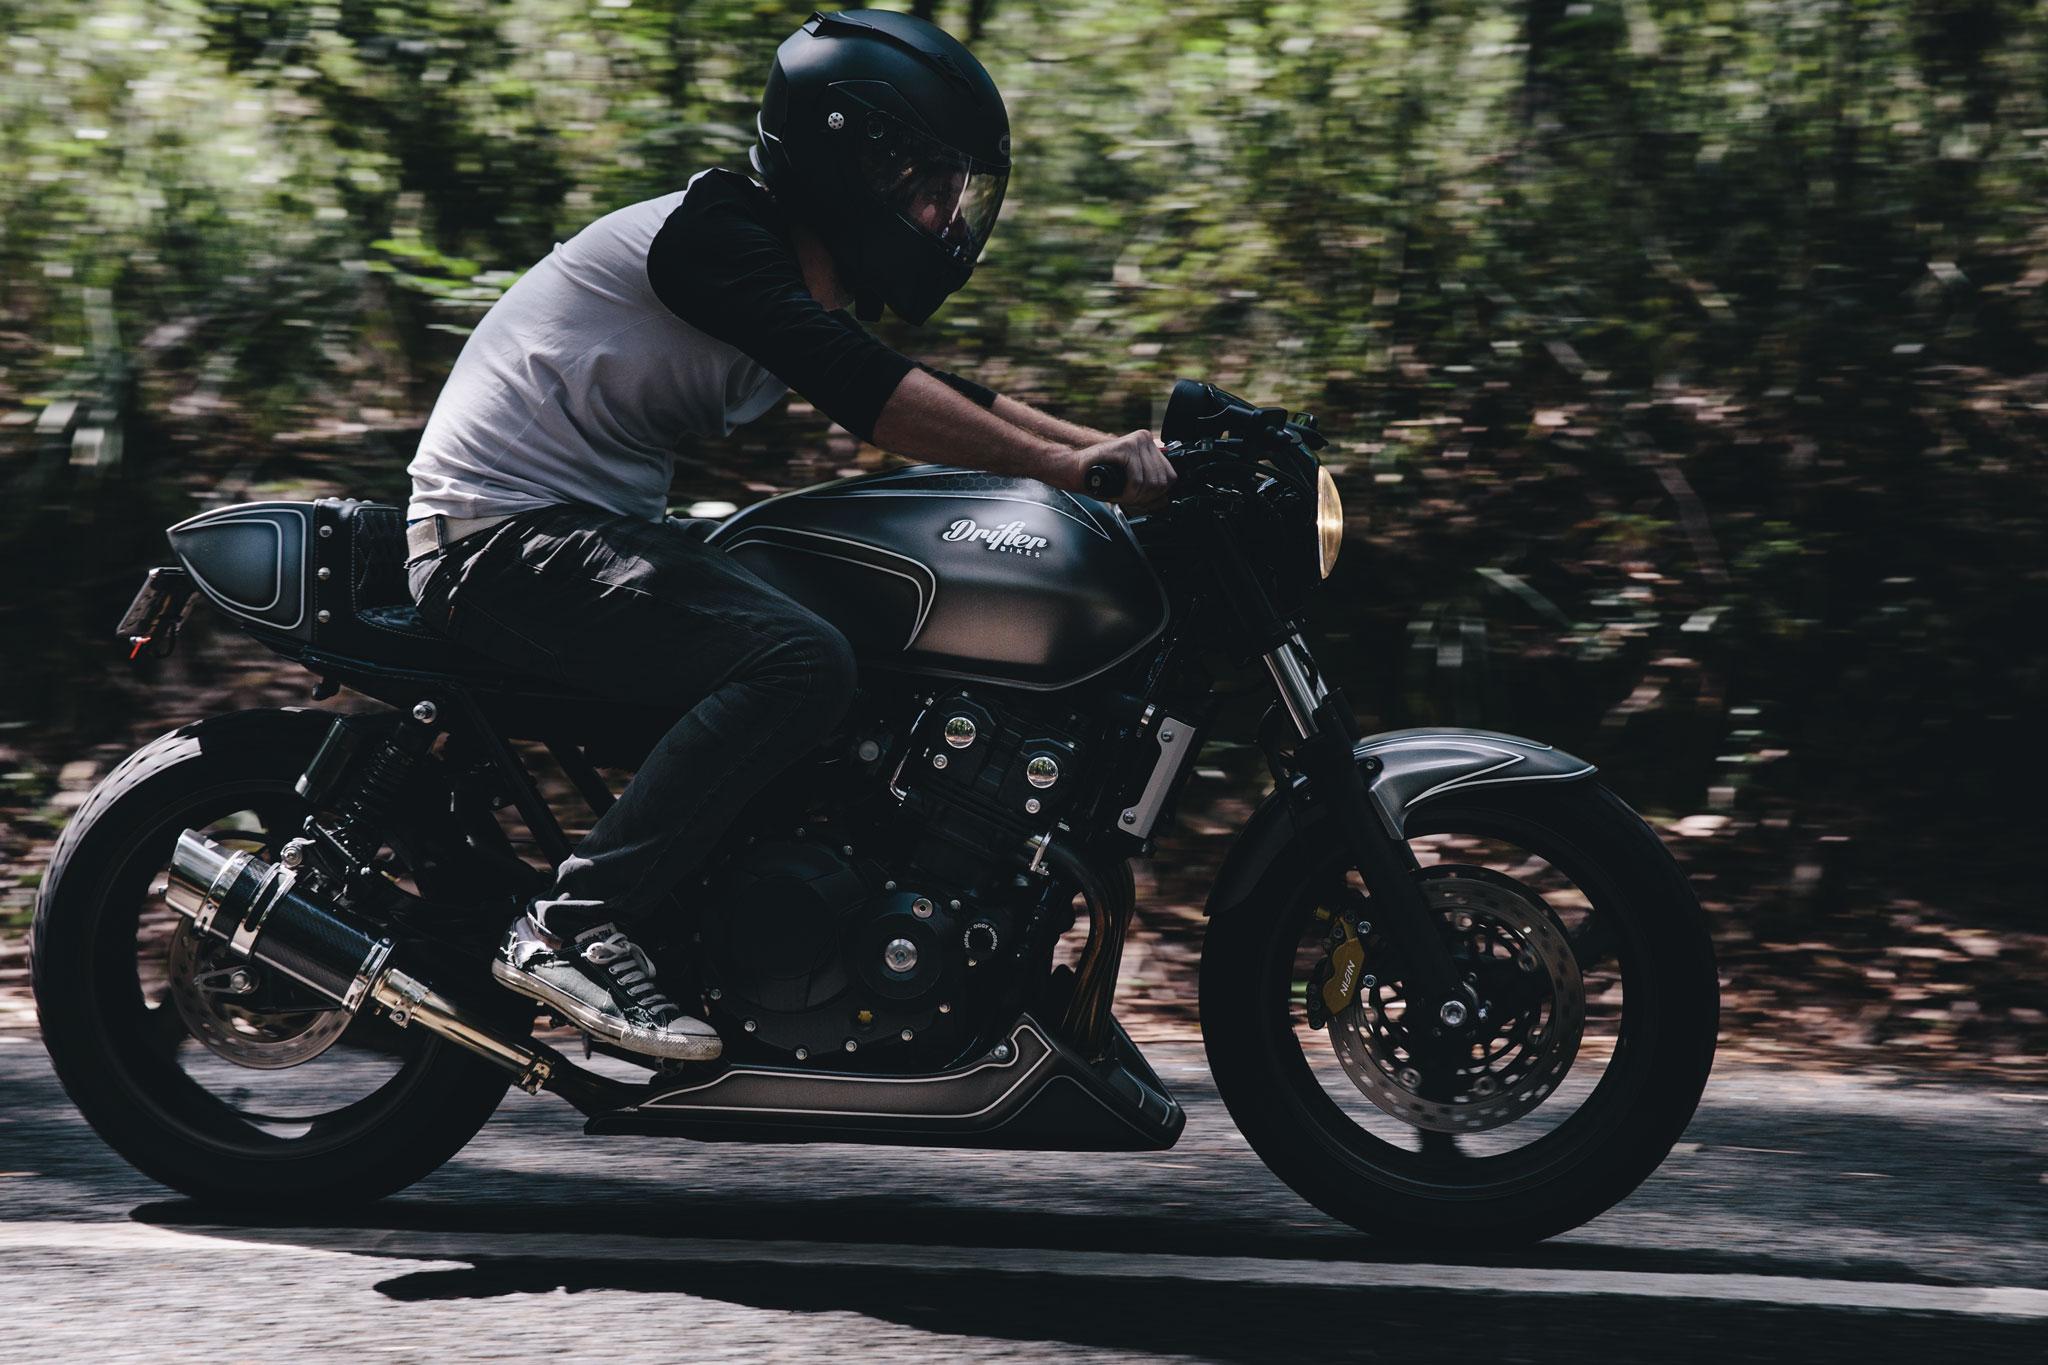 honda_cb400sf_drifterbikes_cafe_racer-169